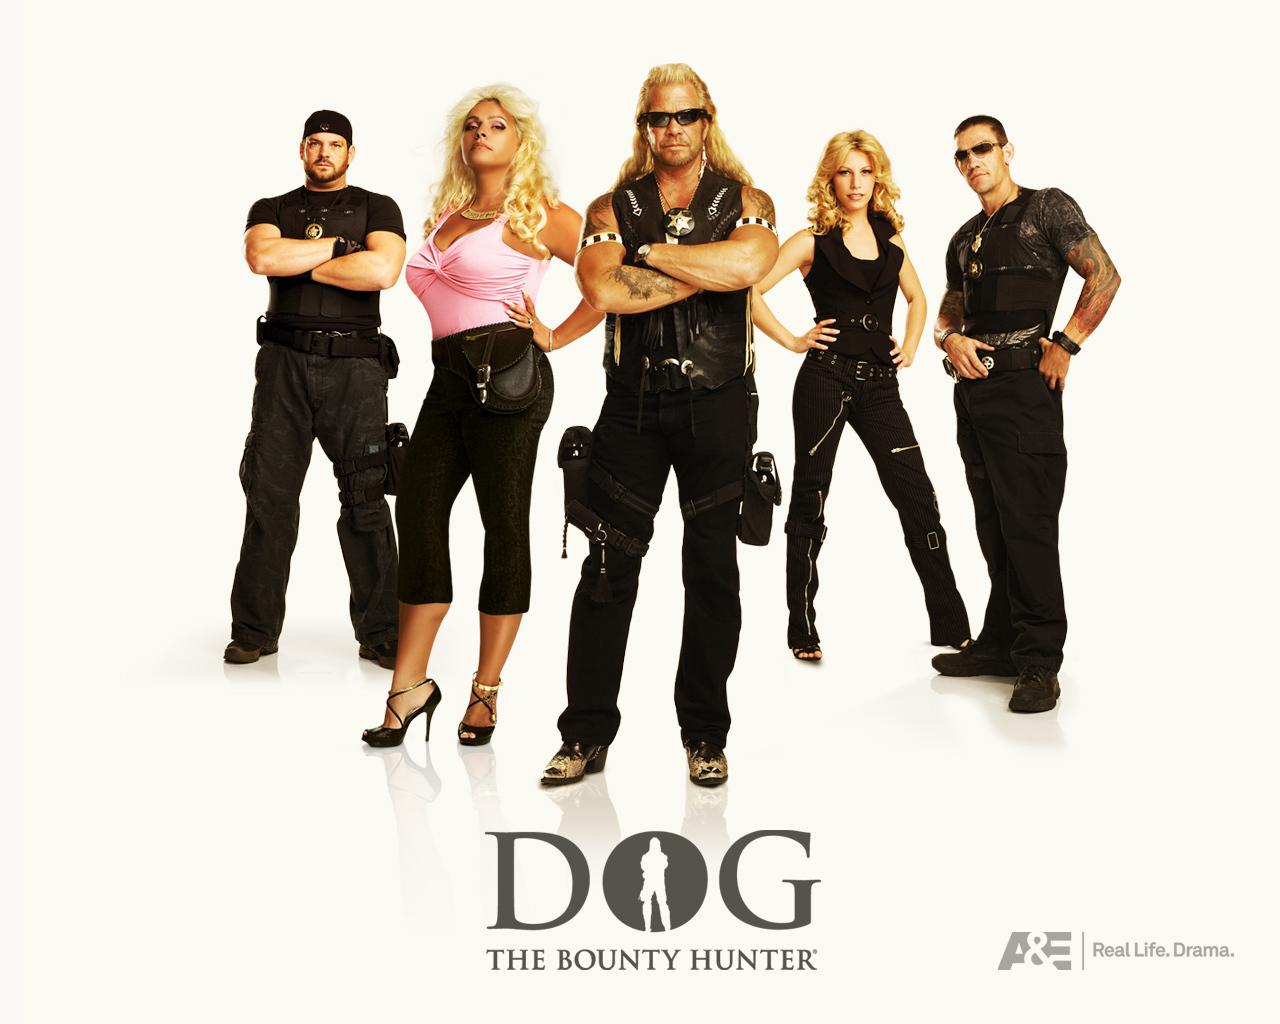 1399128-dog_the_bounty_hunter_dog_the_bounty_hunter_1852504_1280_1024